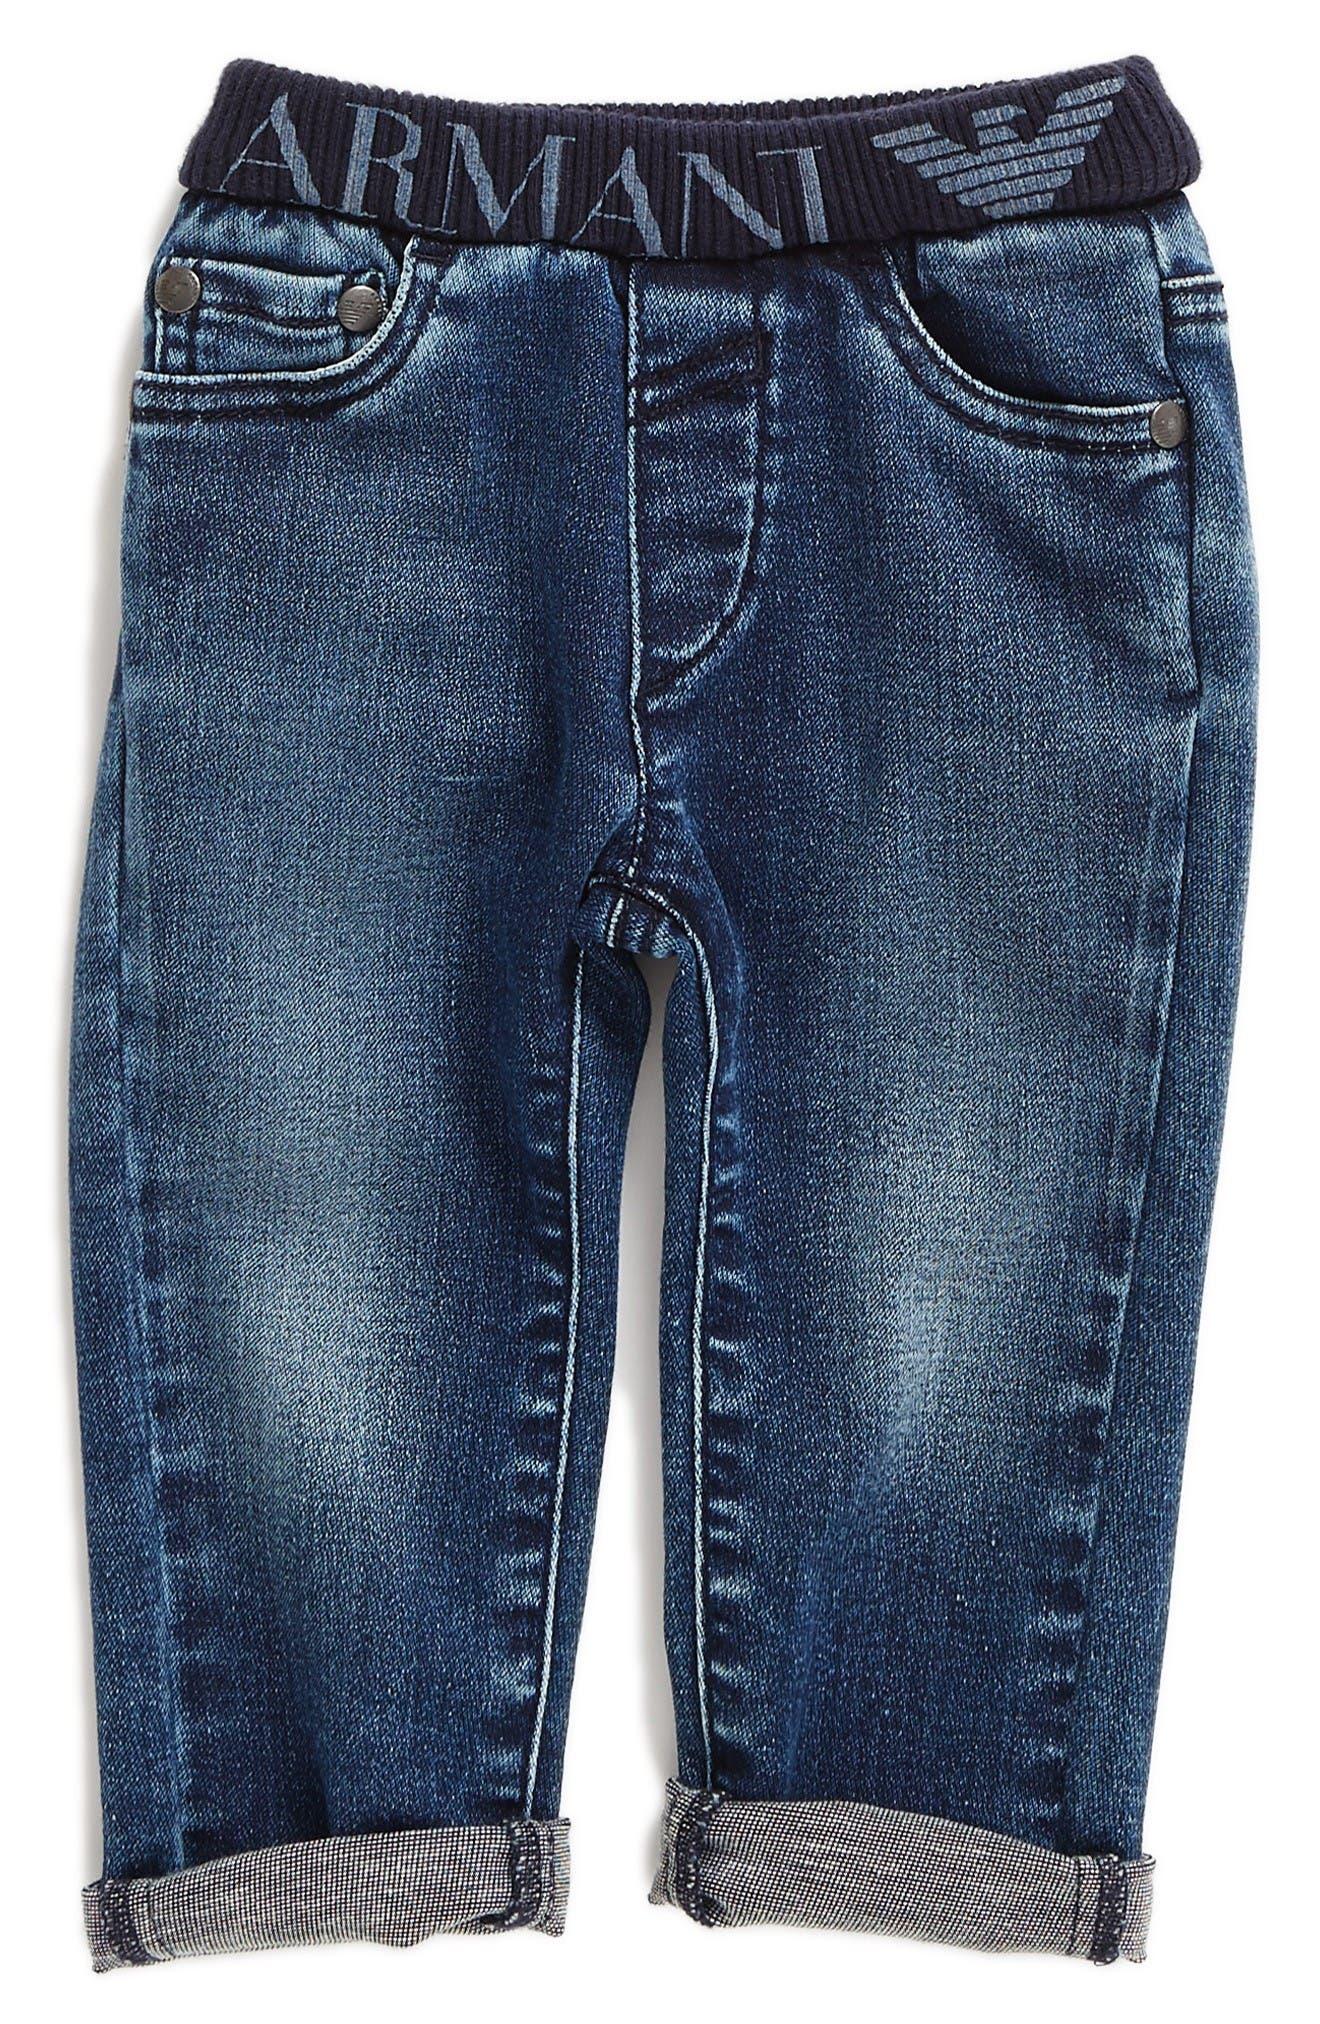 Main Image - Armani Junior Elastic Waist Cuffed Jeans (Baby Boys)